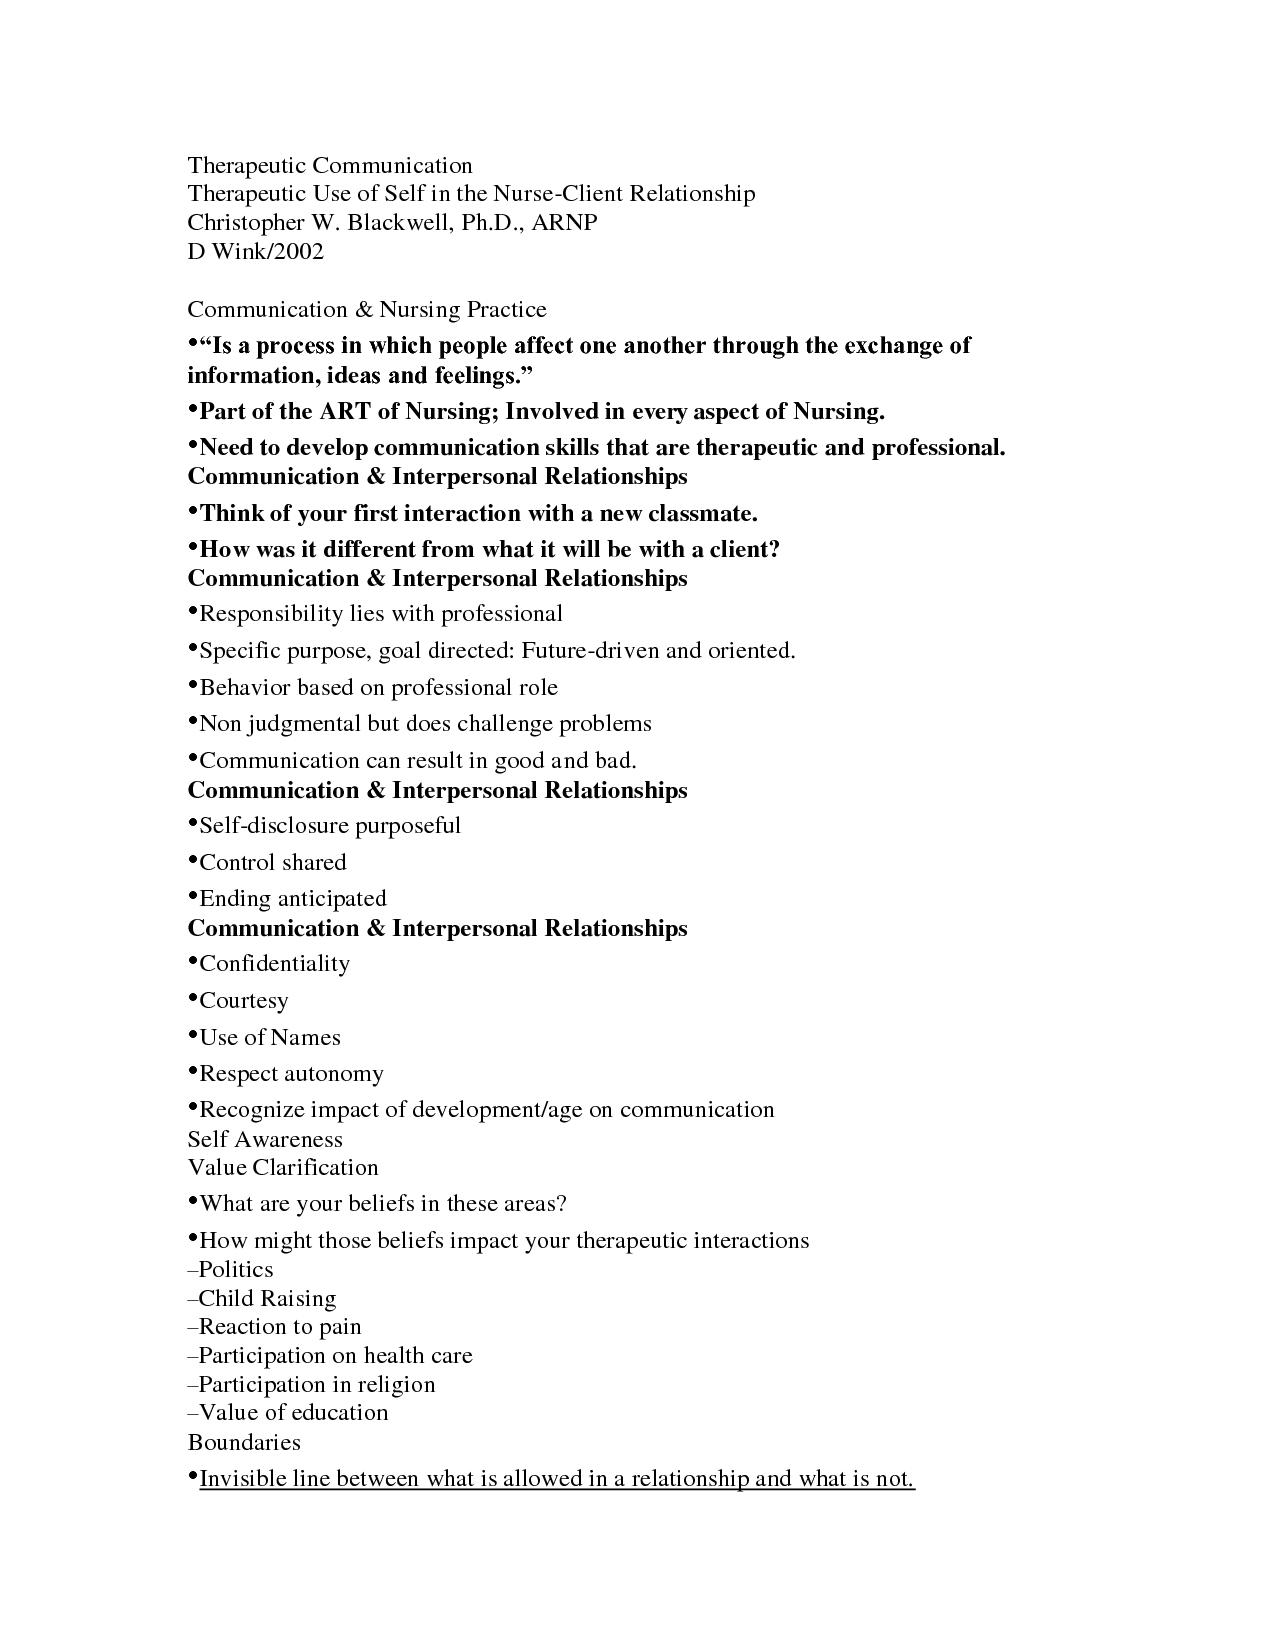 Therapeutic Communication Nursing Math Therapeutic Nursing Education